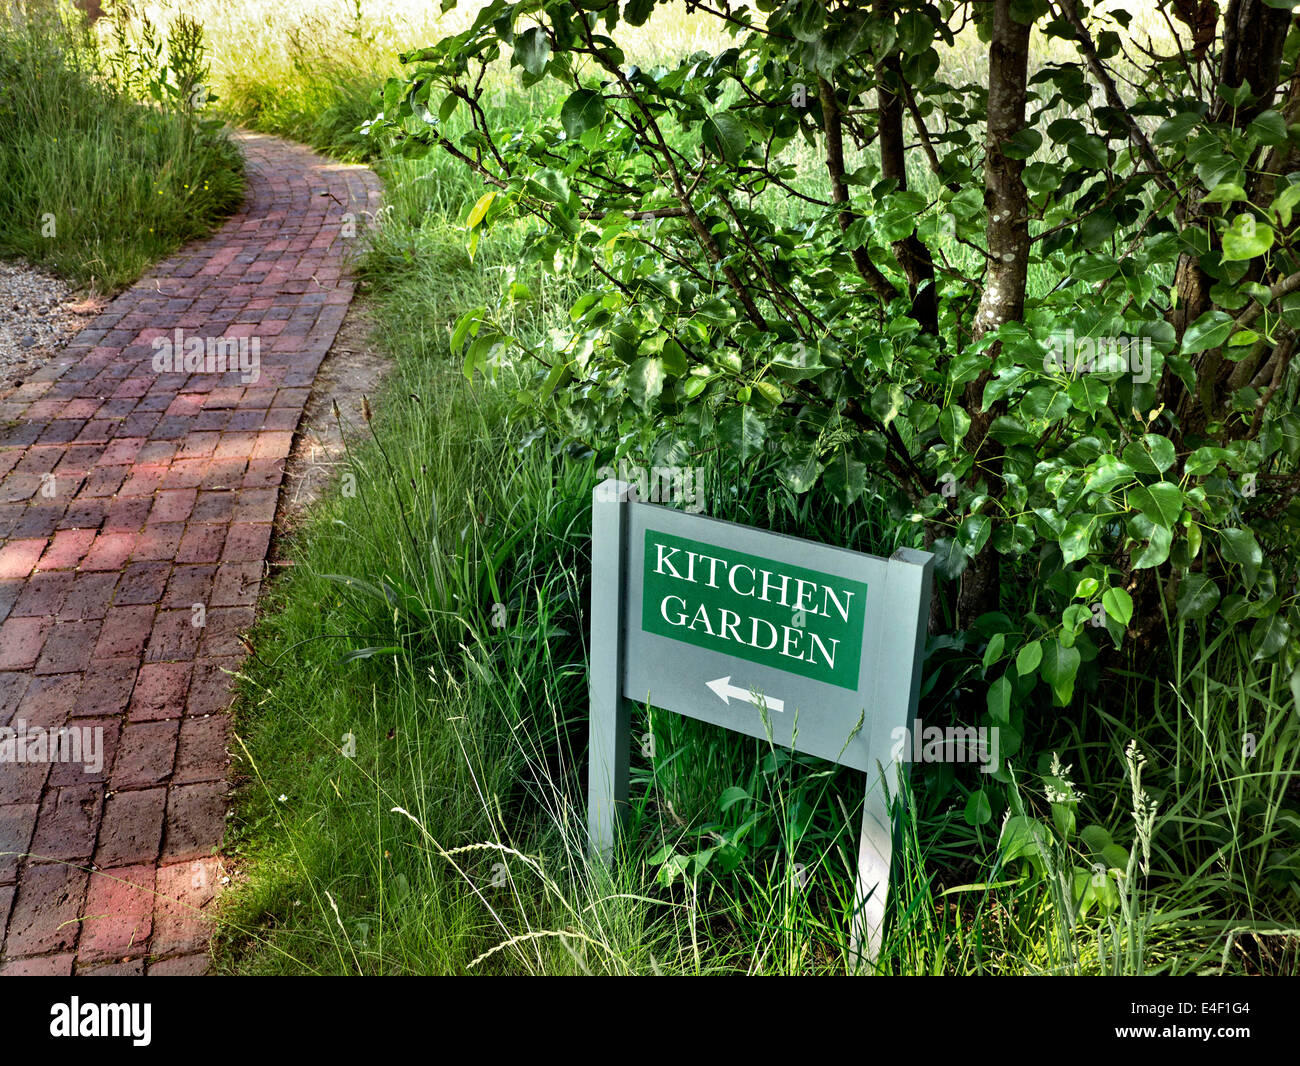 Sign pointing to restaurant Kitchen Garden - Stock Image